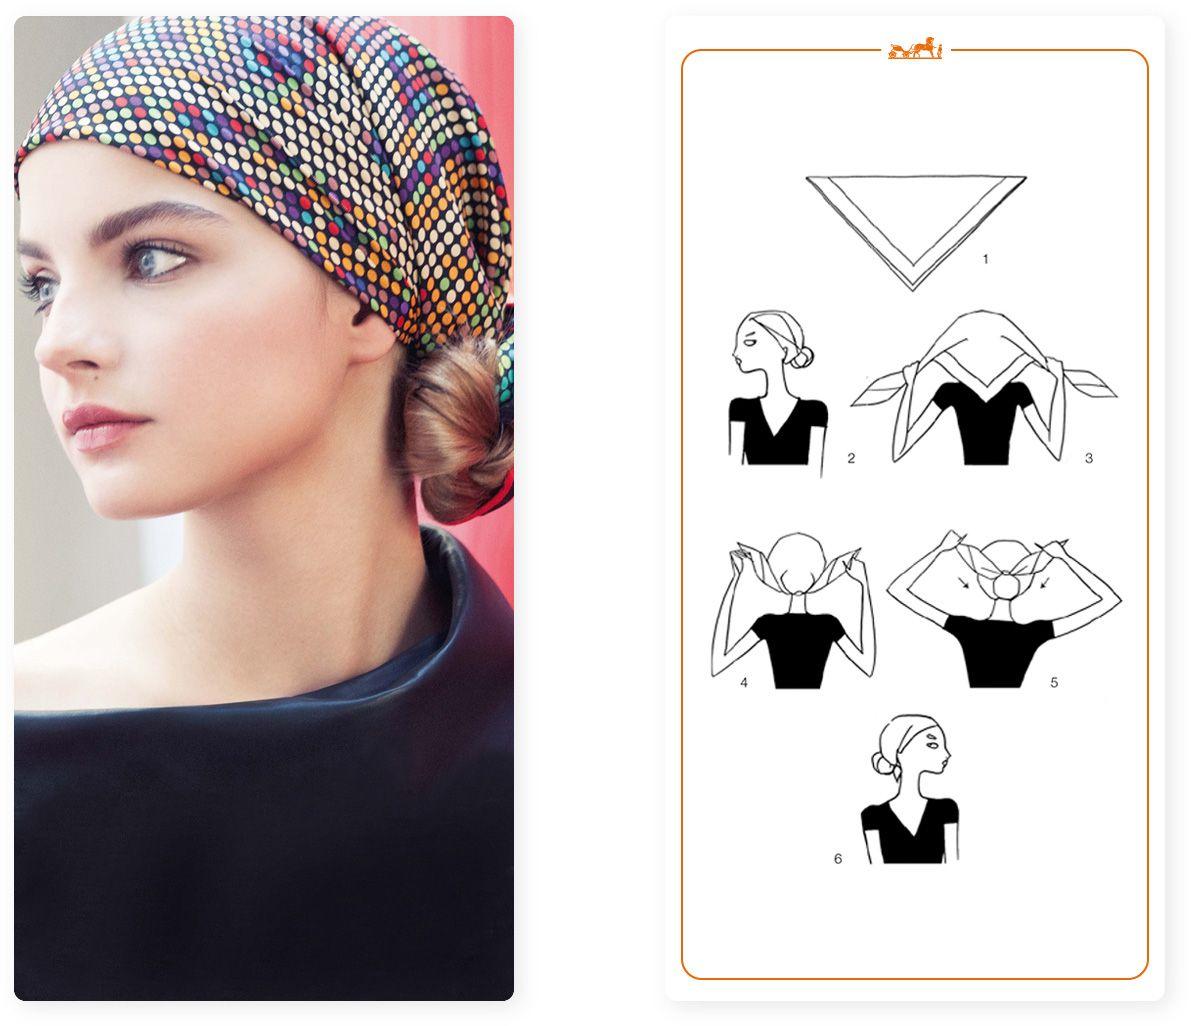 Pin de Esther Schmidt en Outfits | Pinterest | Mascaras, Peinados y ...